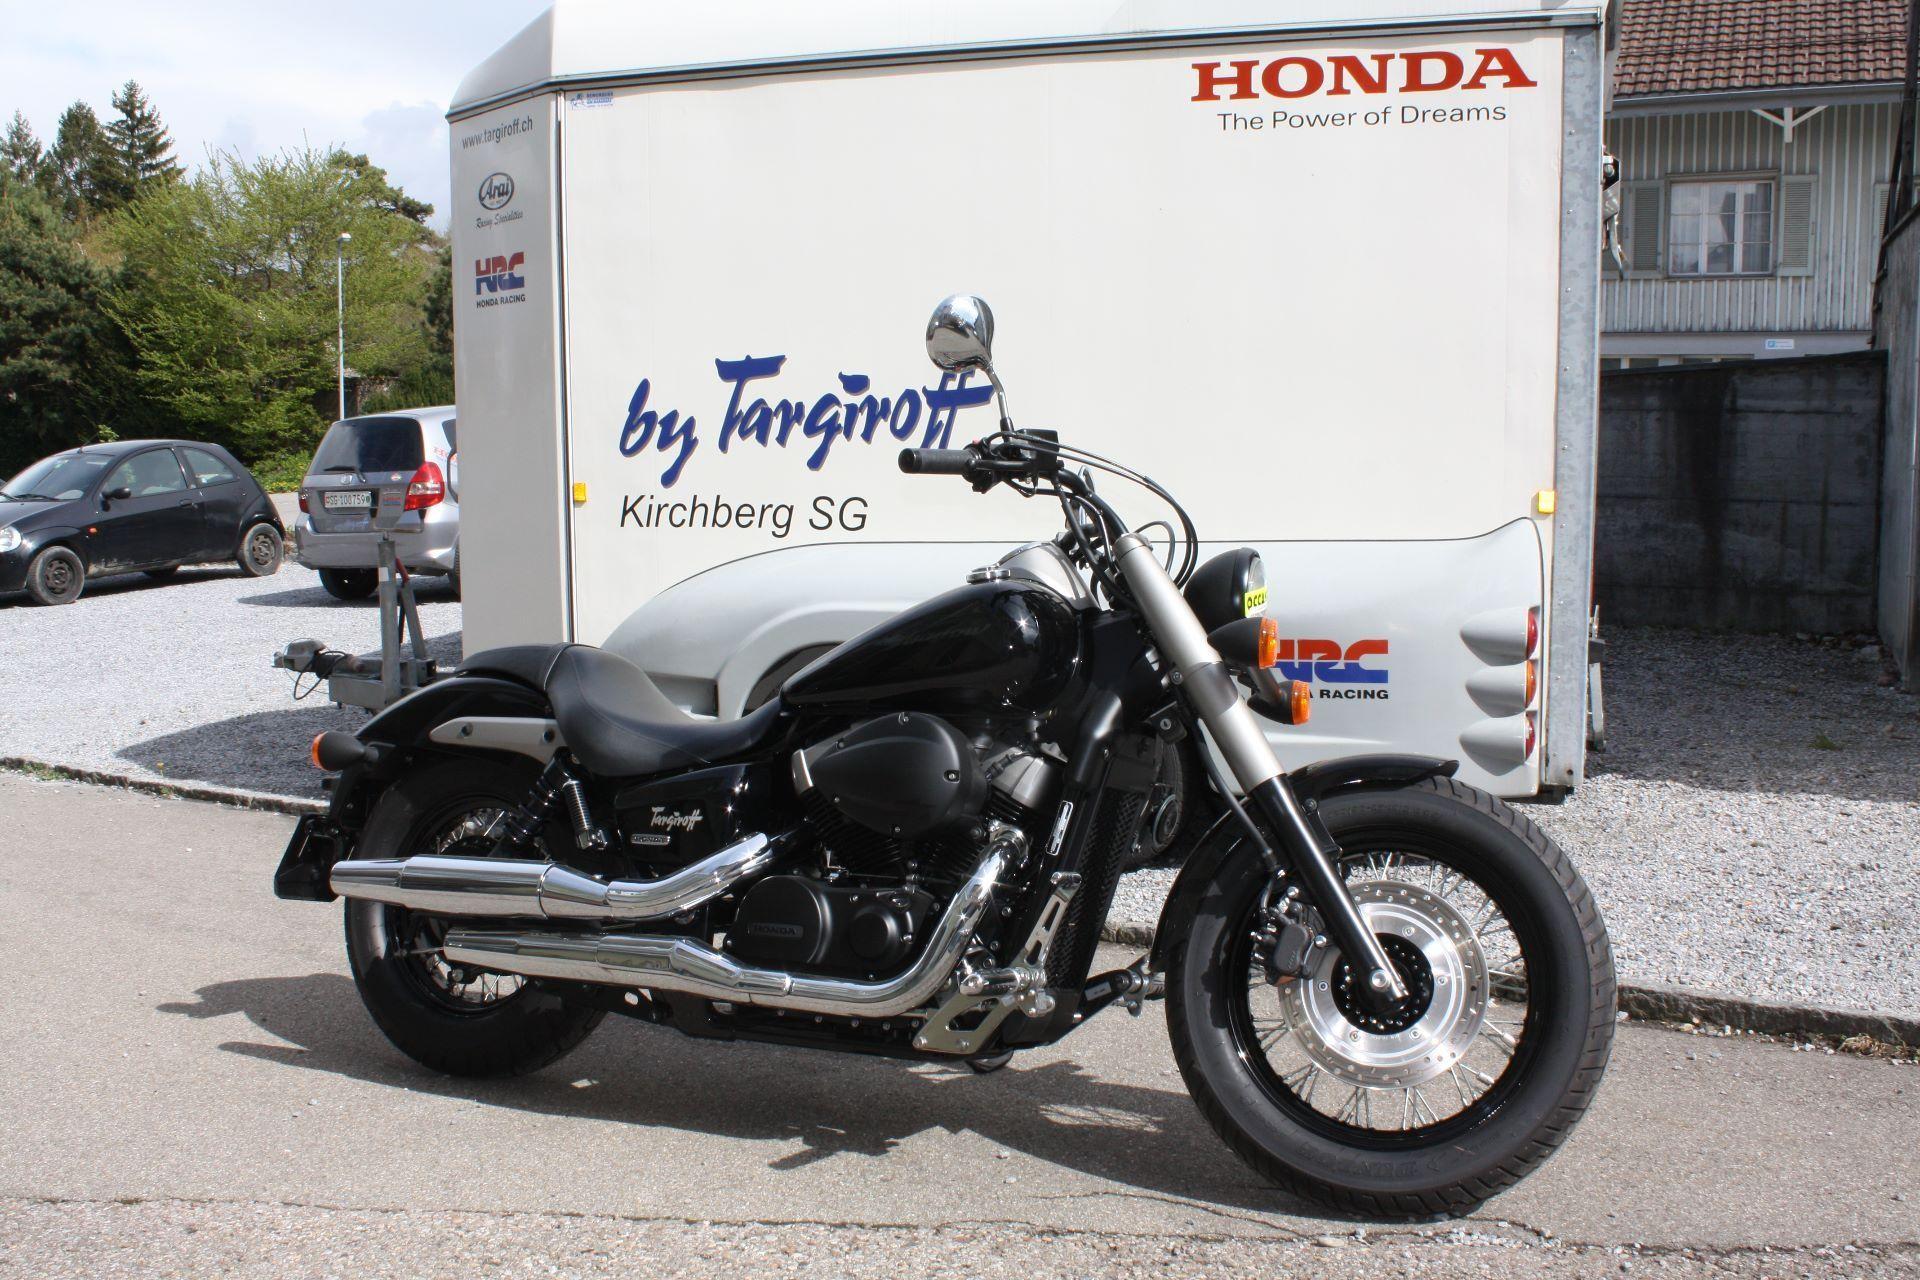 motorrad occasion kaufen honda vt 750 c2 b targiroff moto center ag kirchberg. Black Bedroom Furniture Sets. Home Design Ideas